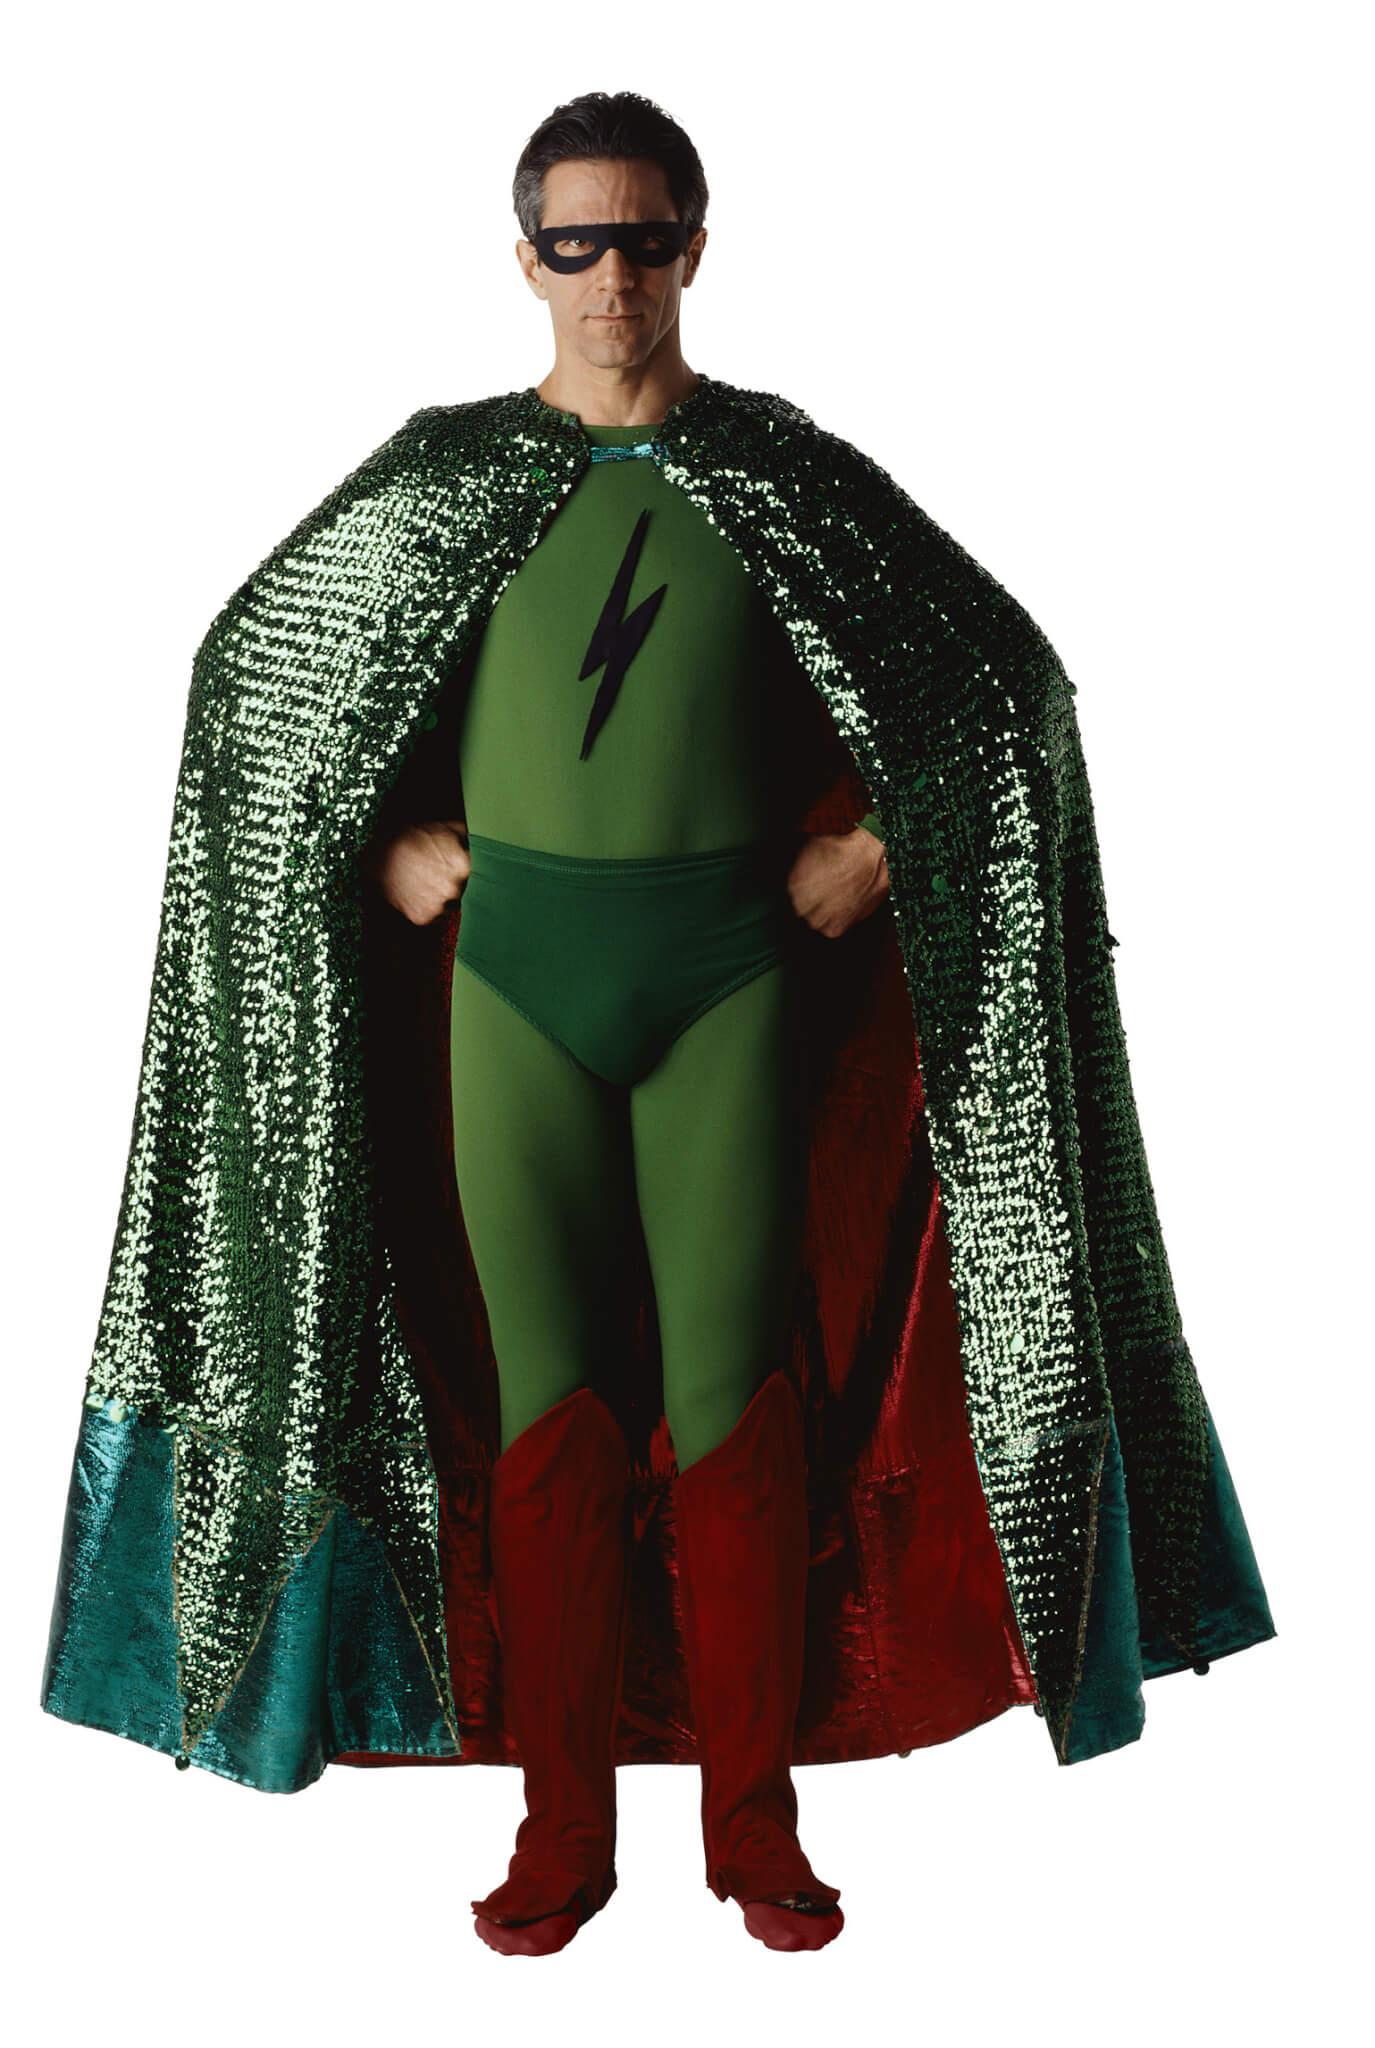 Dave in full cape